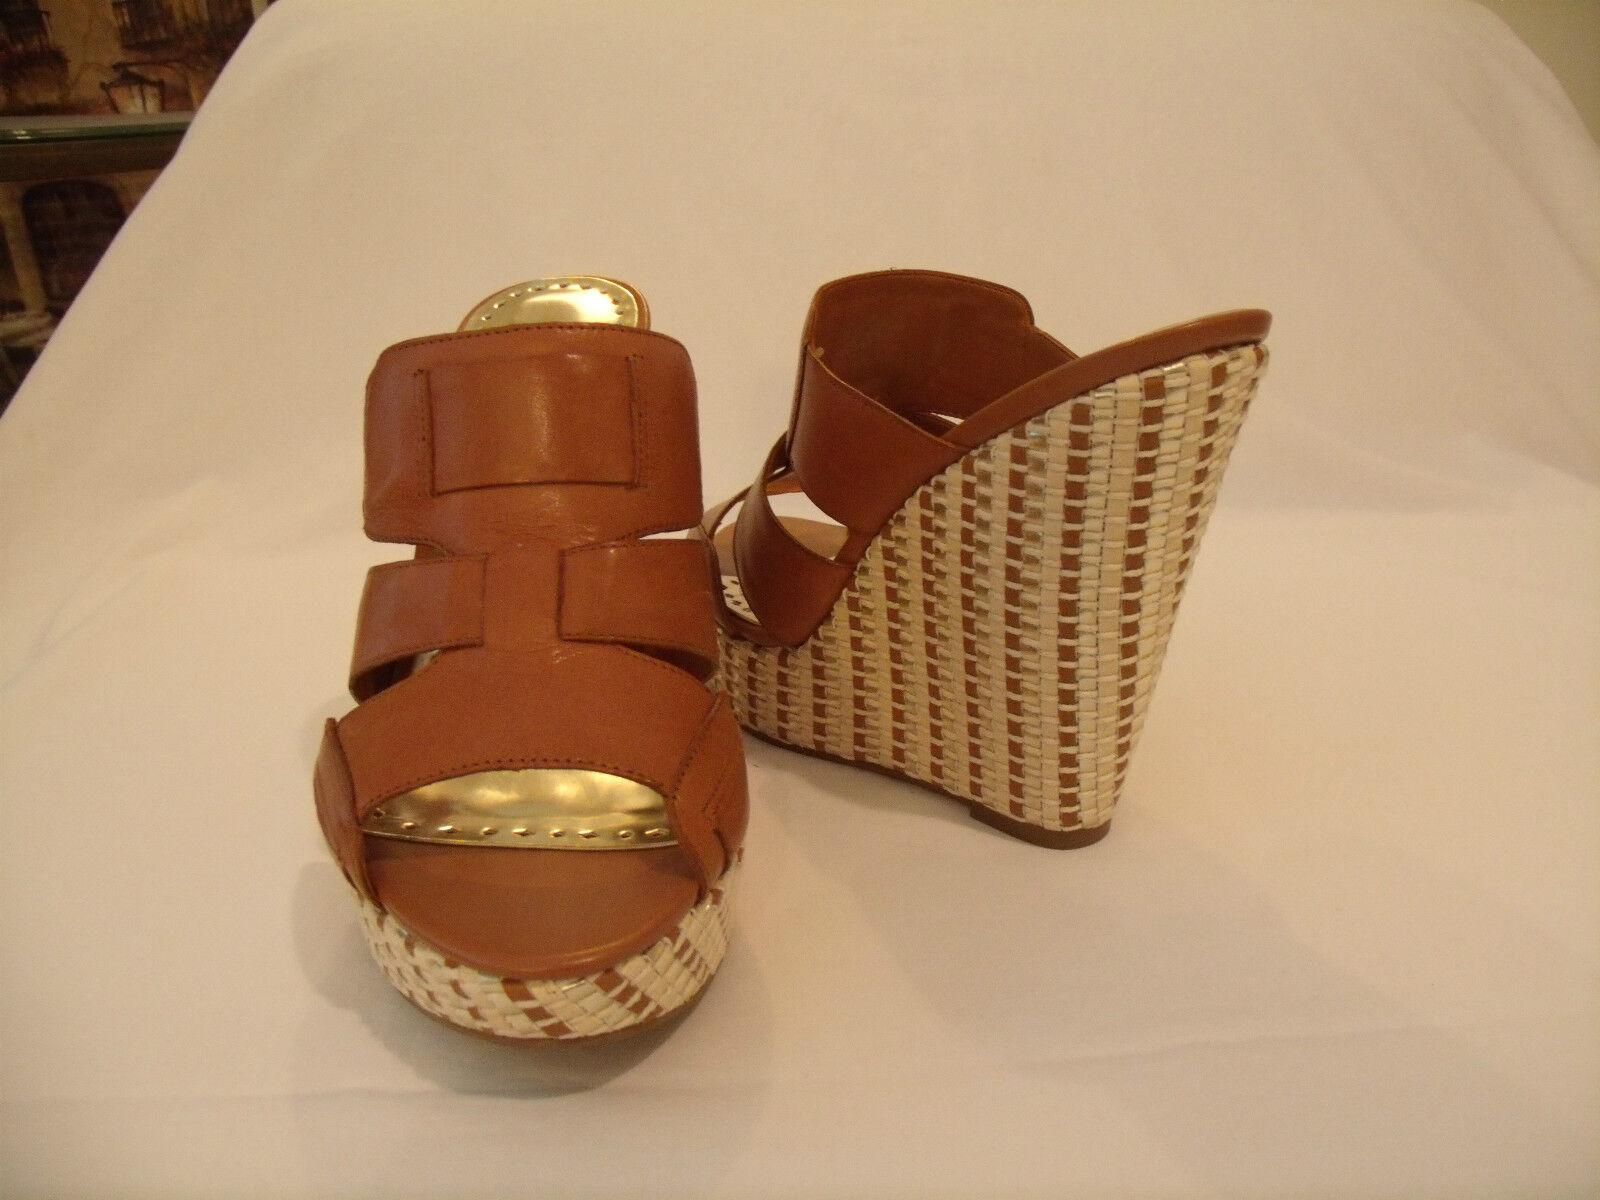 prezzi bassi BCBG  Gail  (N.W.B.) 5  Wedge Heel Heel Heel Slide Mule•Leather Upper•Sz 8M NWB.  al prezzo più basso